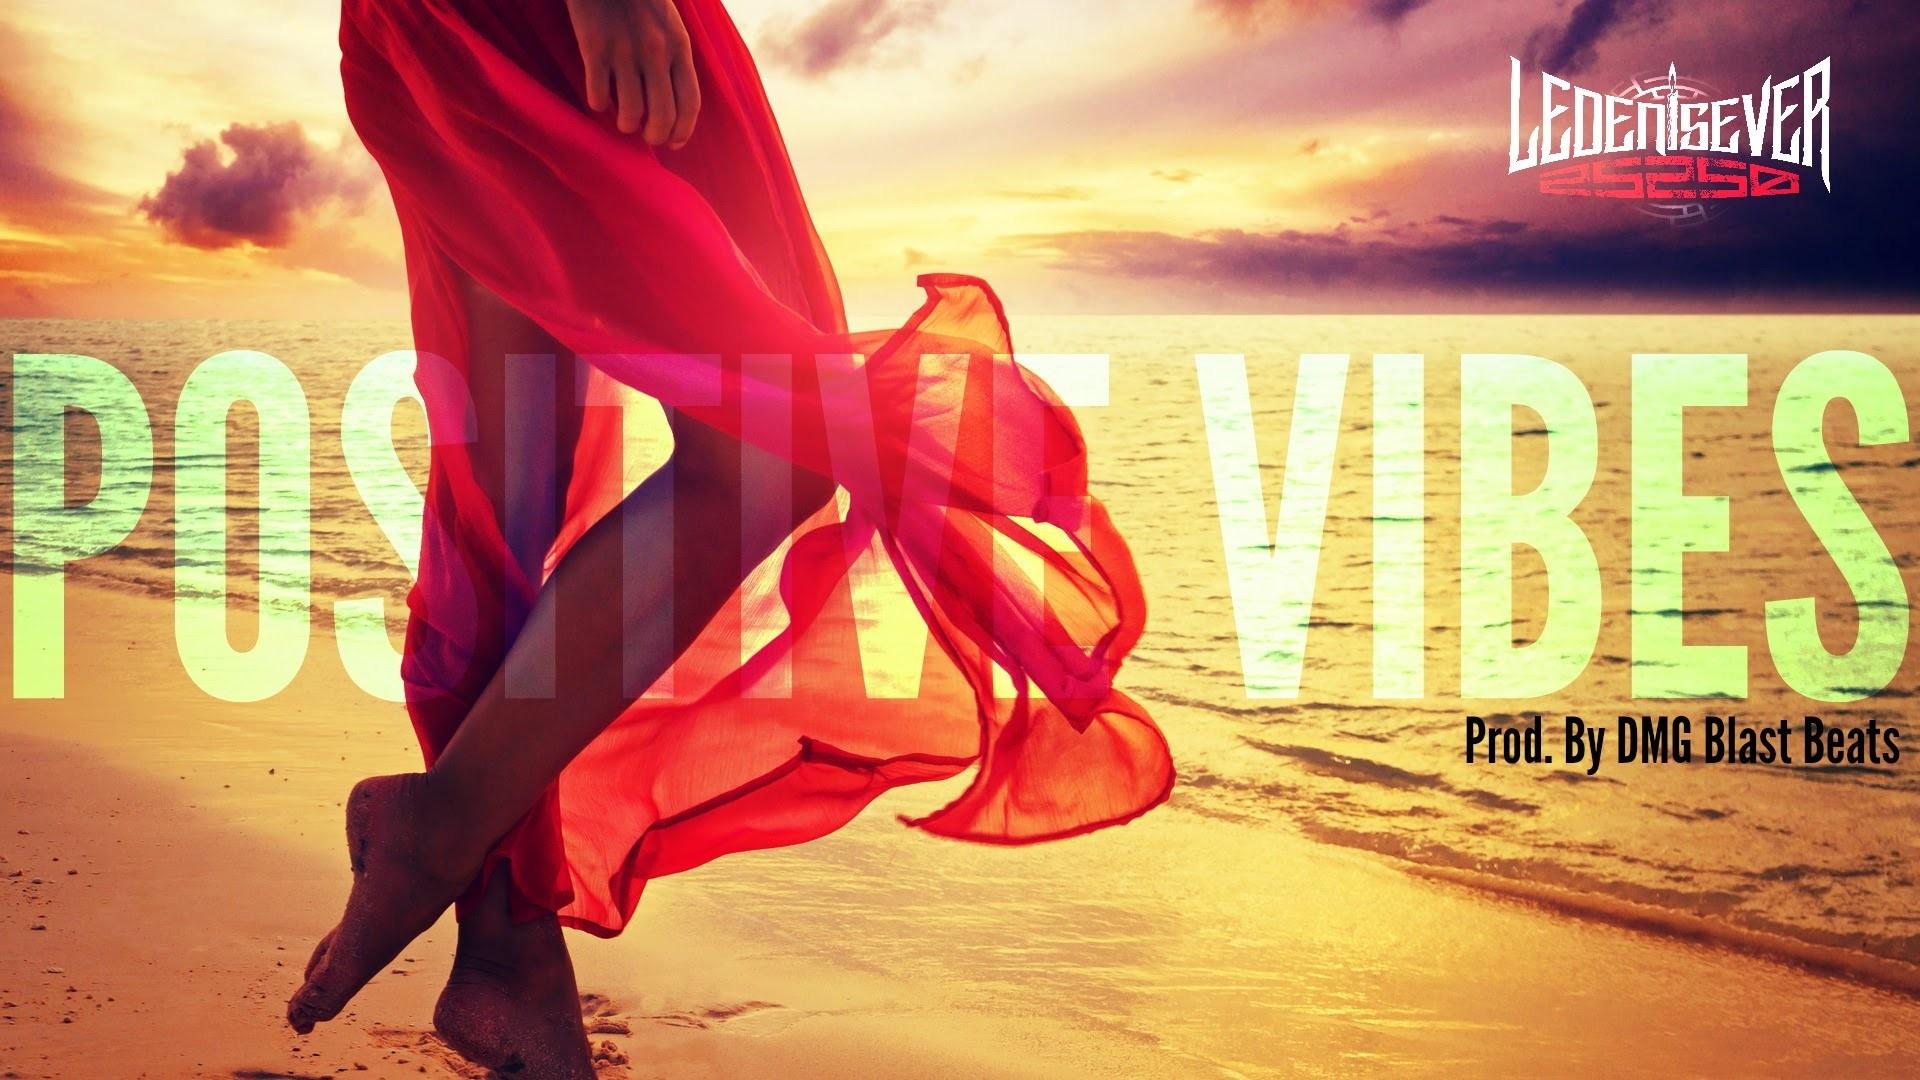 G Funk Instrumental – Positive vibes (Prod.by DMG Blast Beats) HD – YouTube